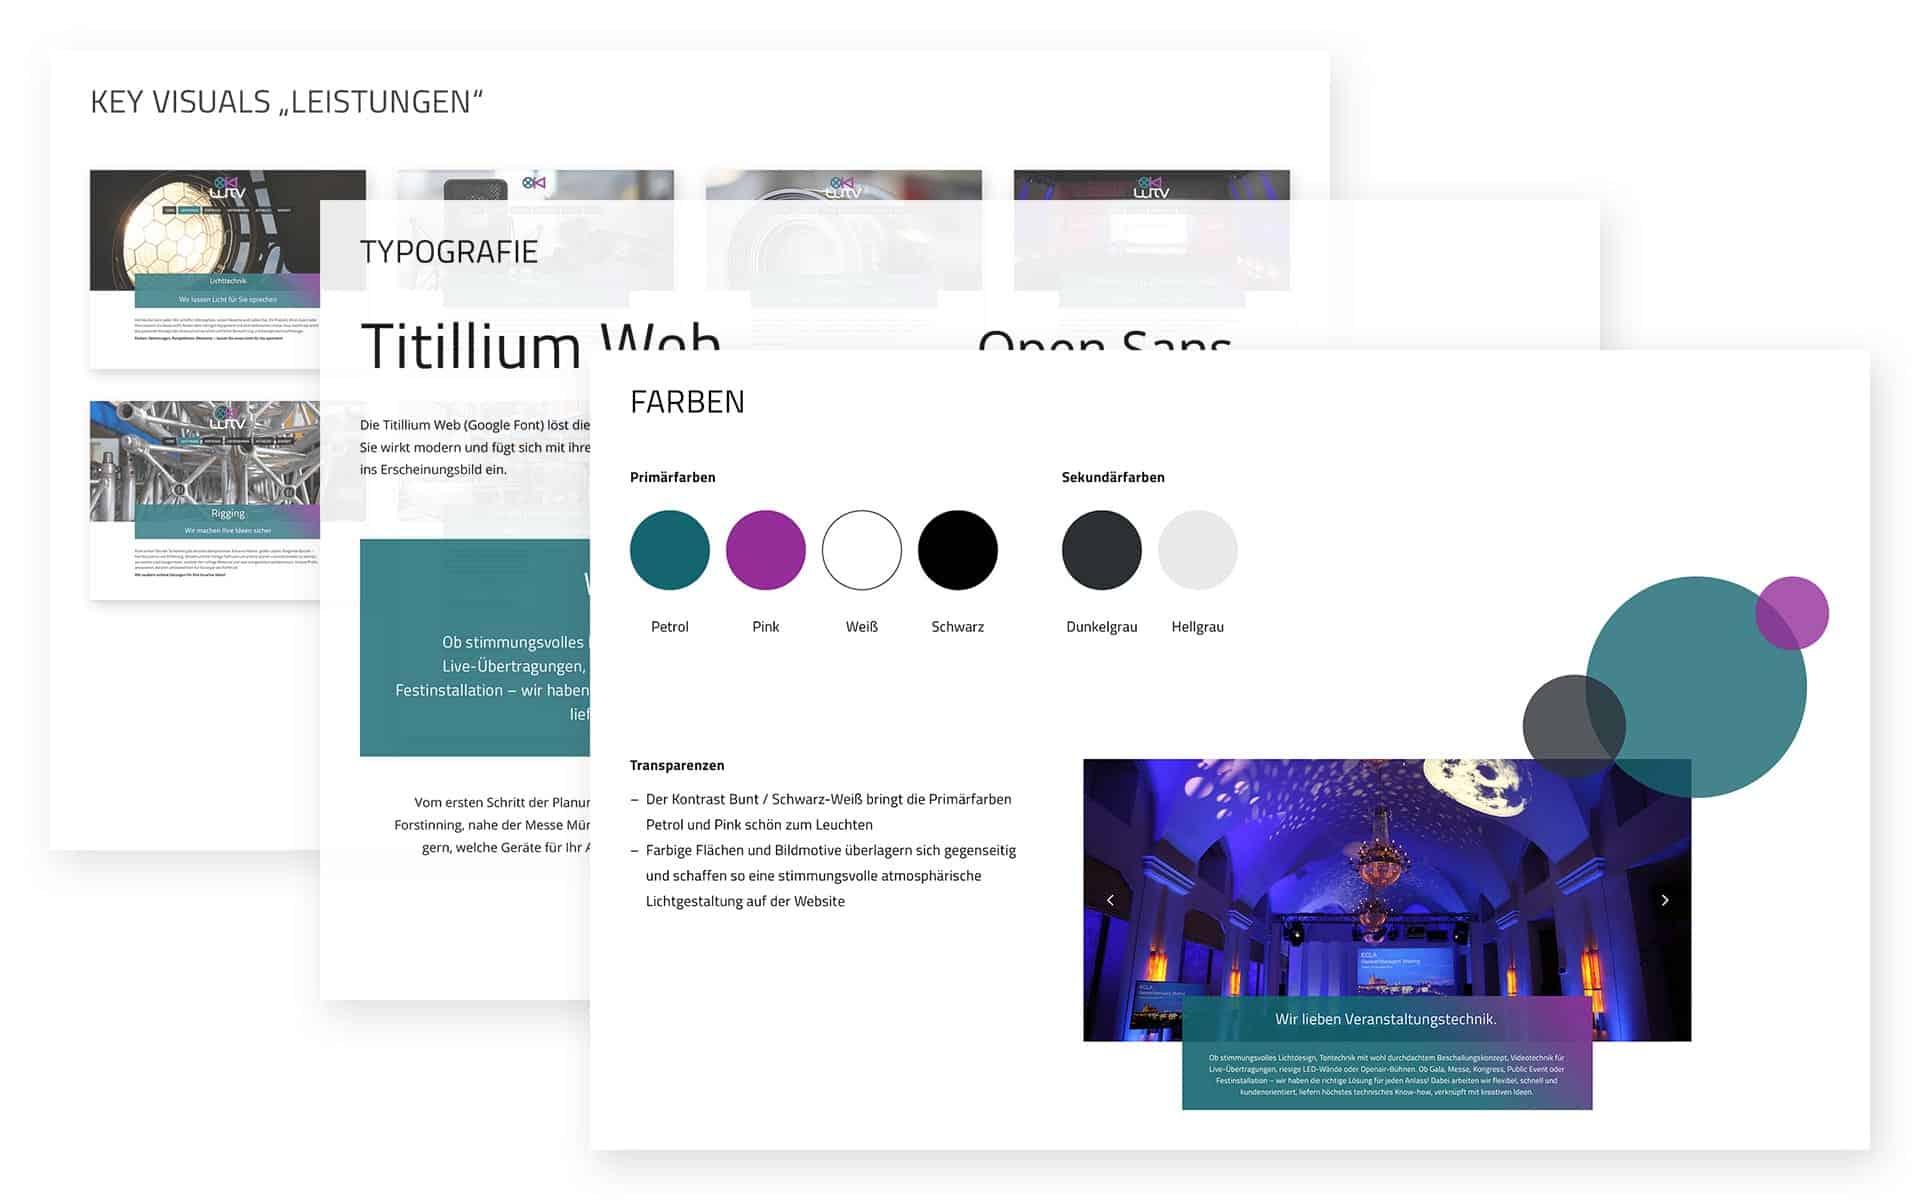 LuTV Veranstaltungstechnik: Brand Guide